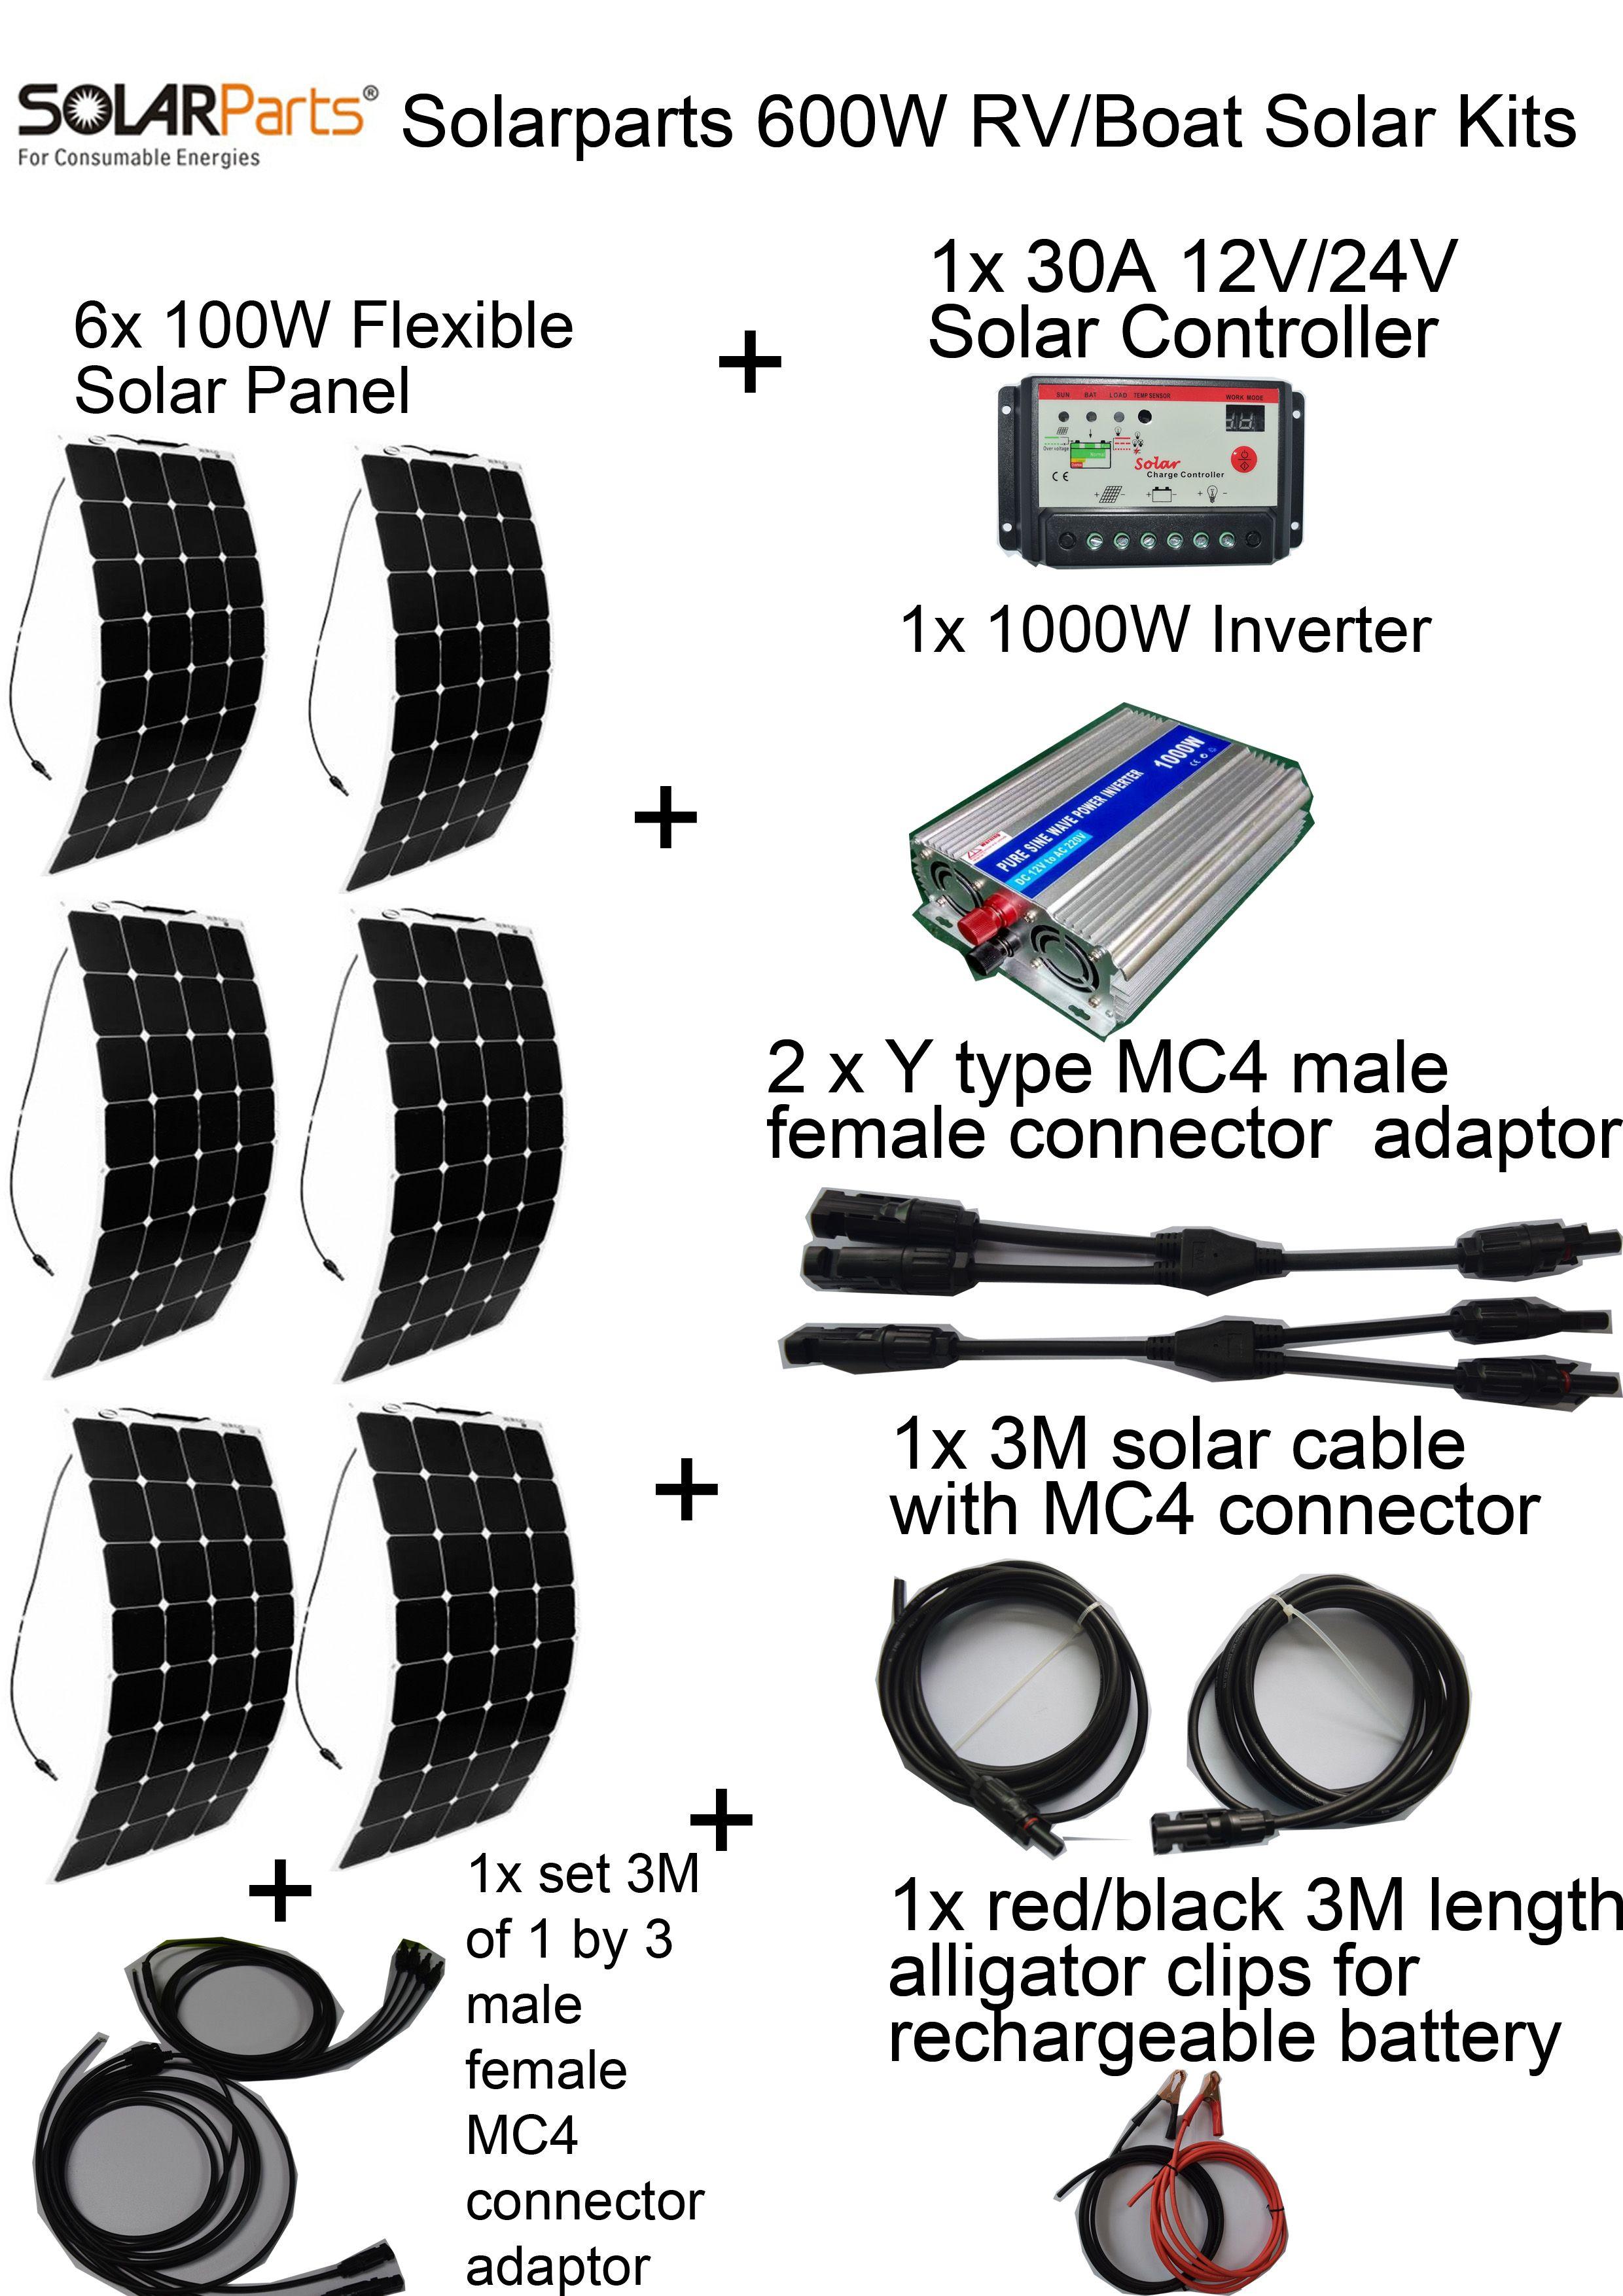 600w Diy Kits Solar System 6 X100w Flexible Solar Panel